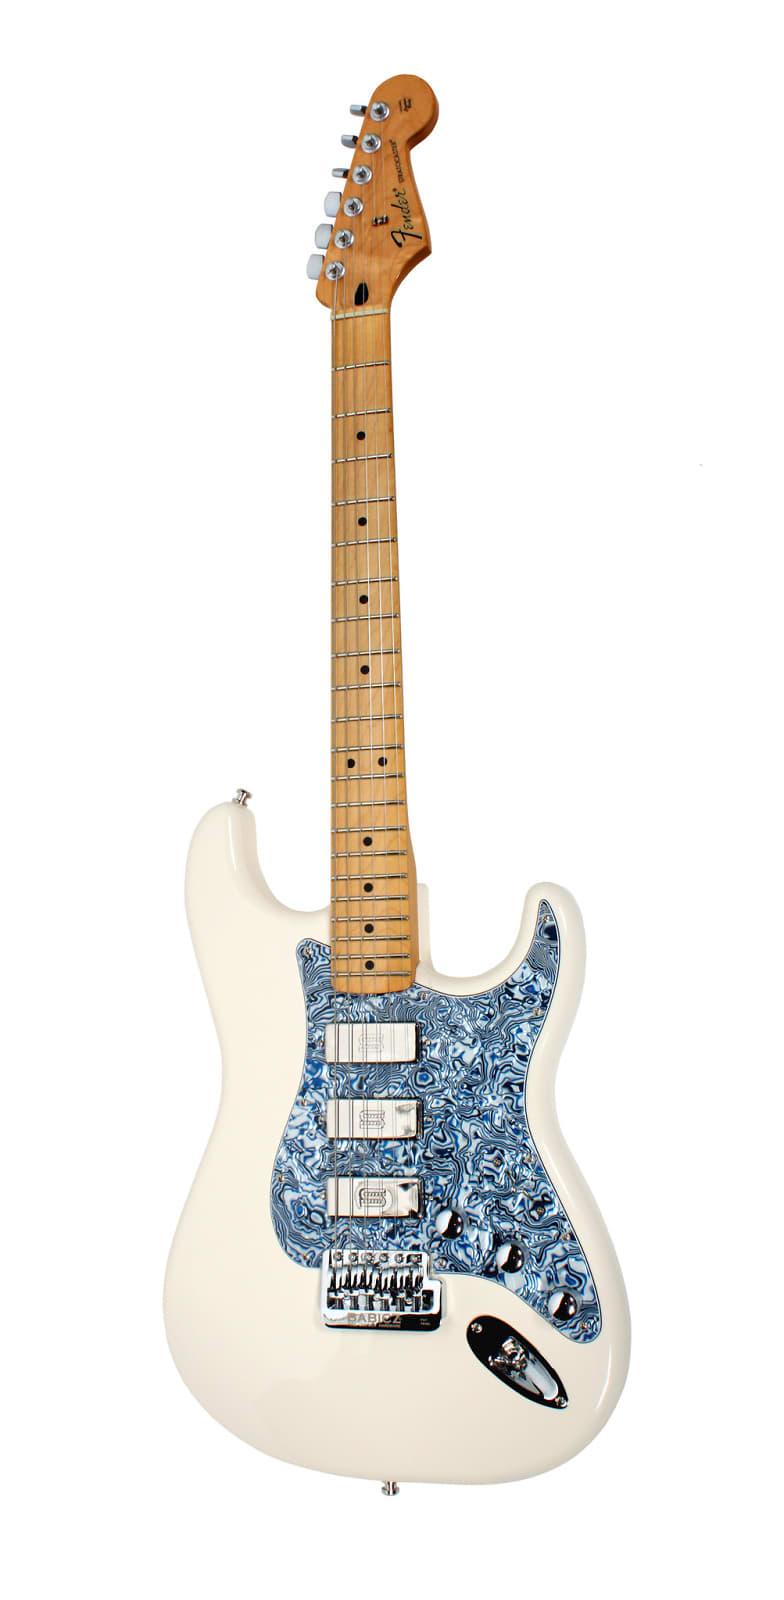 Guitar Pickups For Stratocaster : 920d fender standard strat mod duncan sm 3 mini humbuckers reverb ~ Vivirlamusica.com Haus und Dekorationen